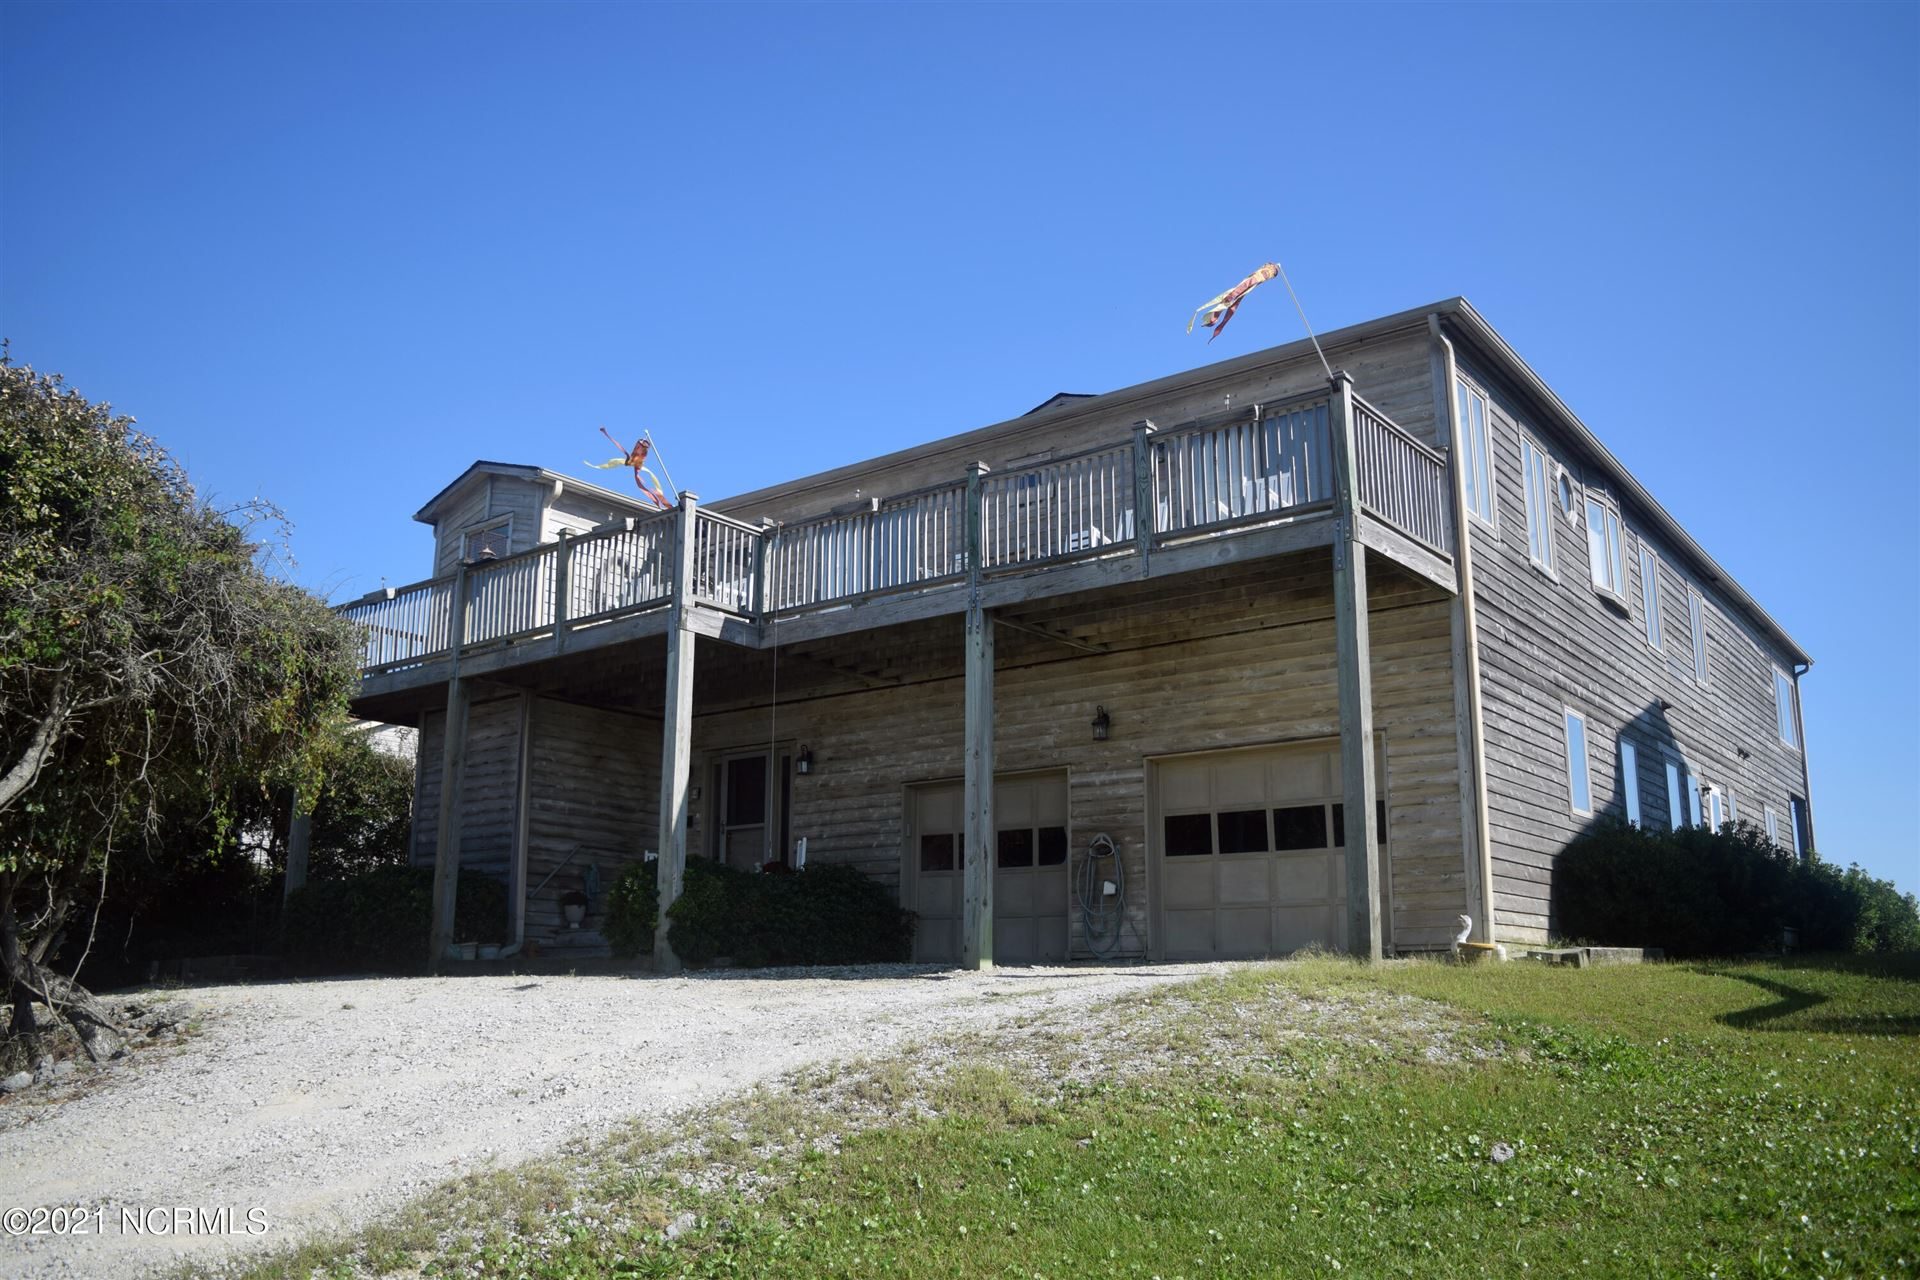 Photo of 3592 Island Drive, North Topsail Beach, NC 28460 (MLS # 100283252)